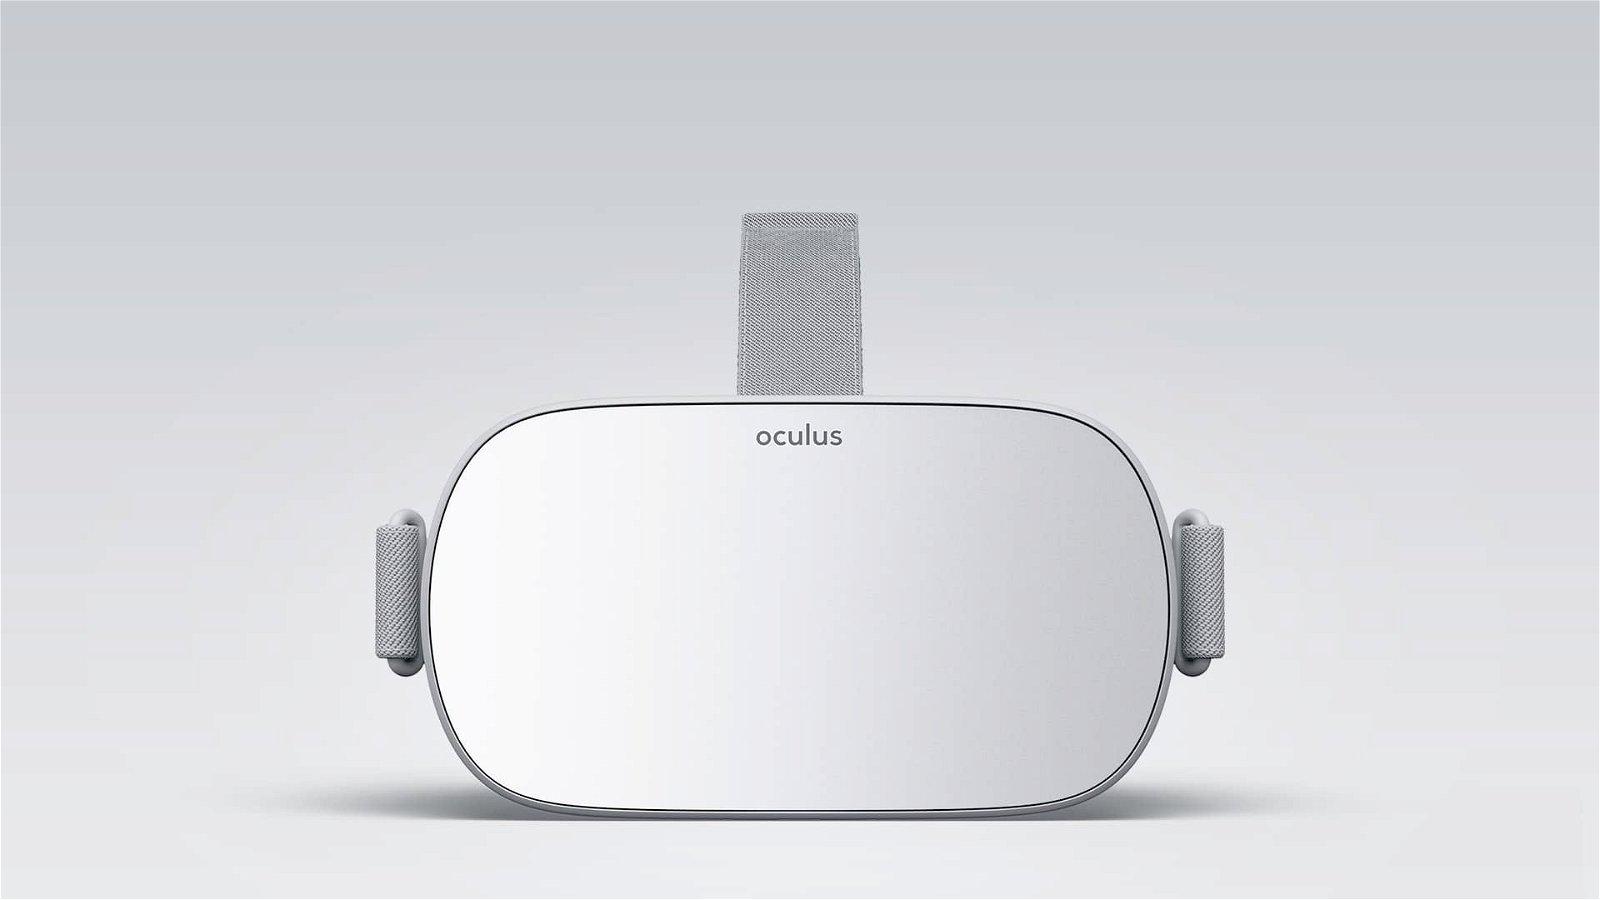 Oculus Go Discontinued To Focus On Oculus Quest